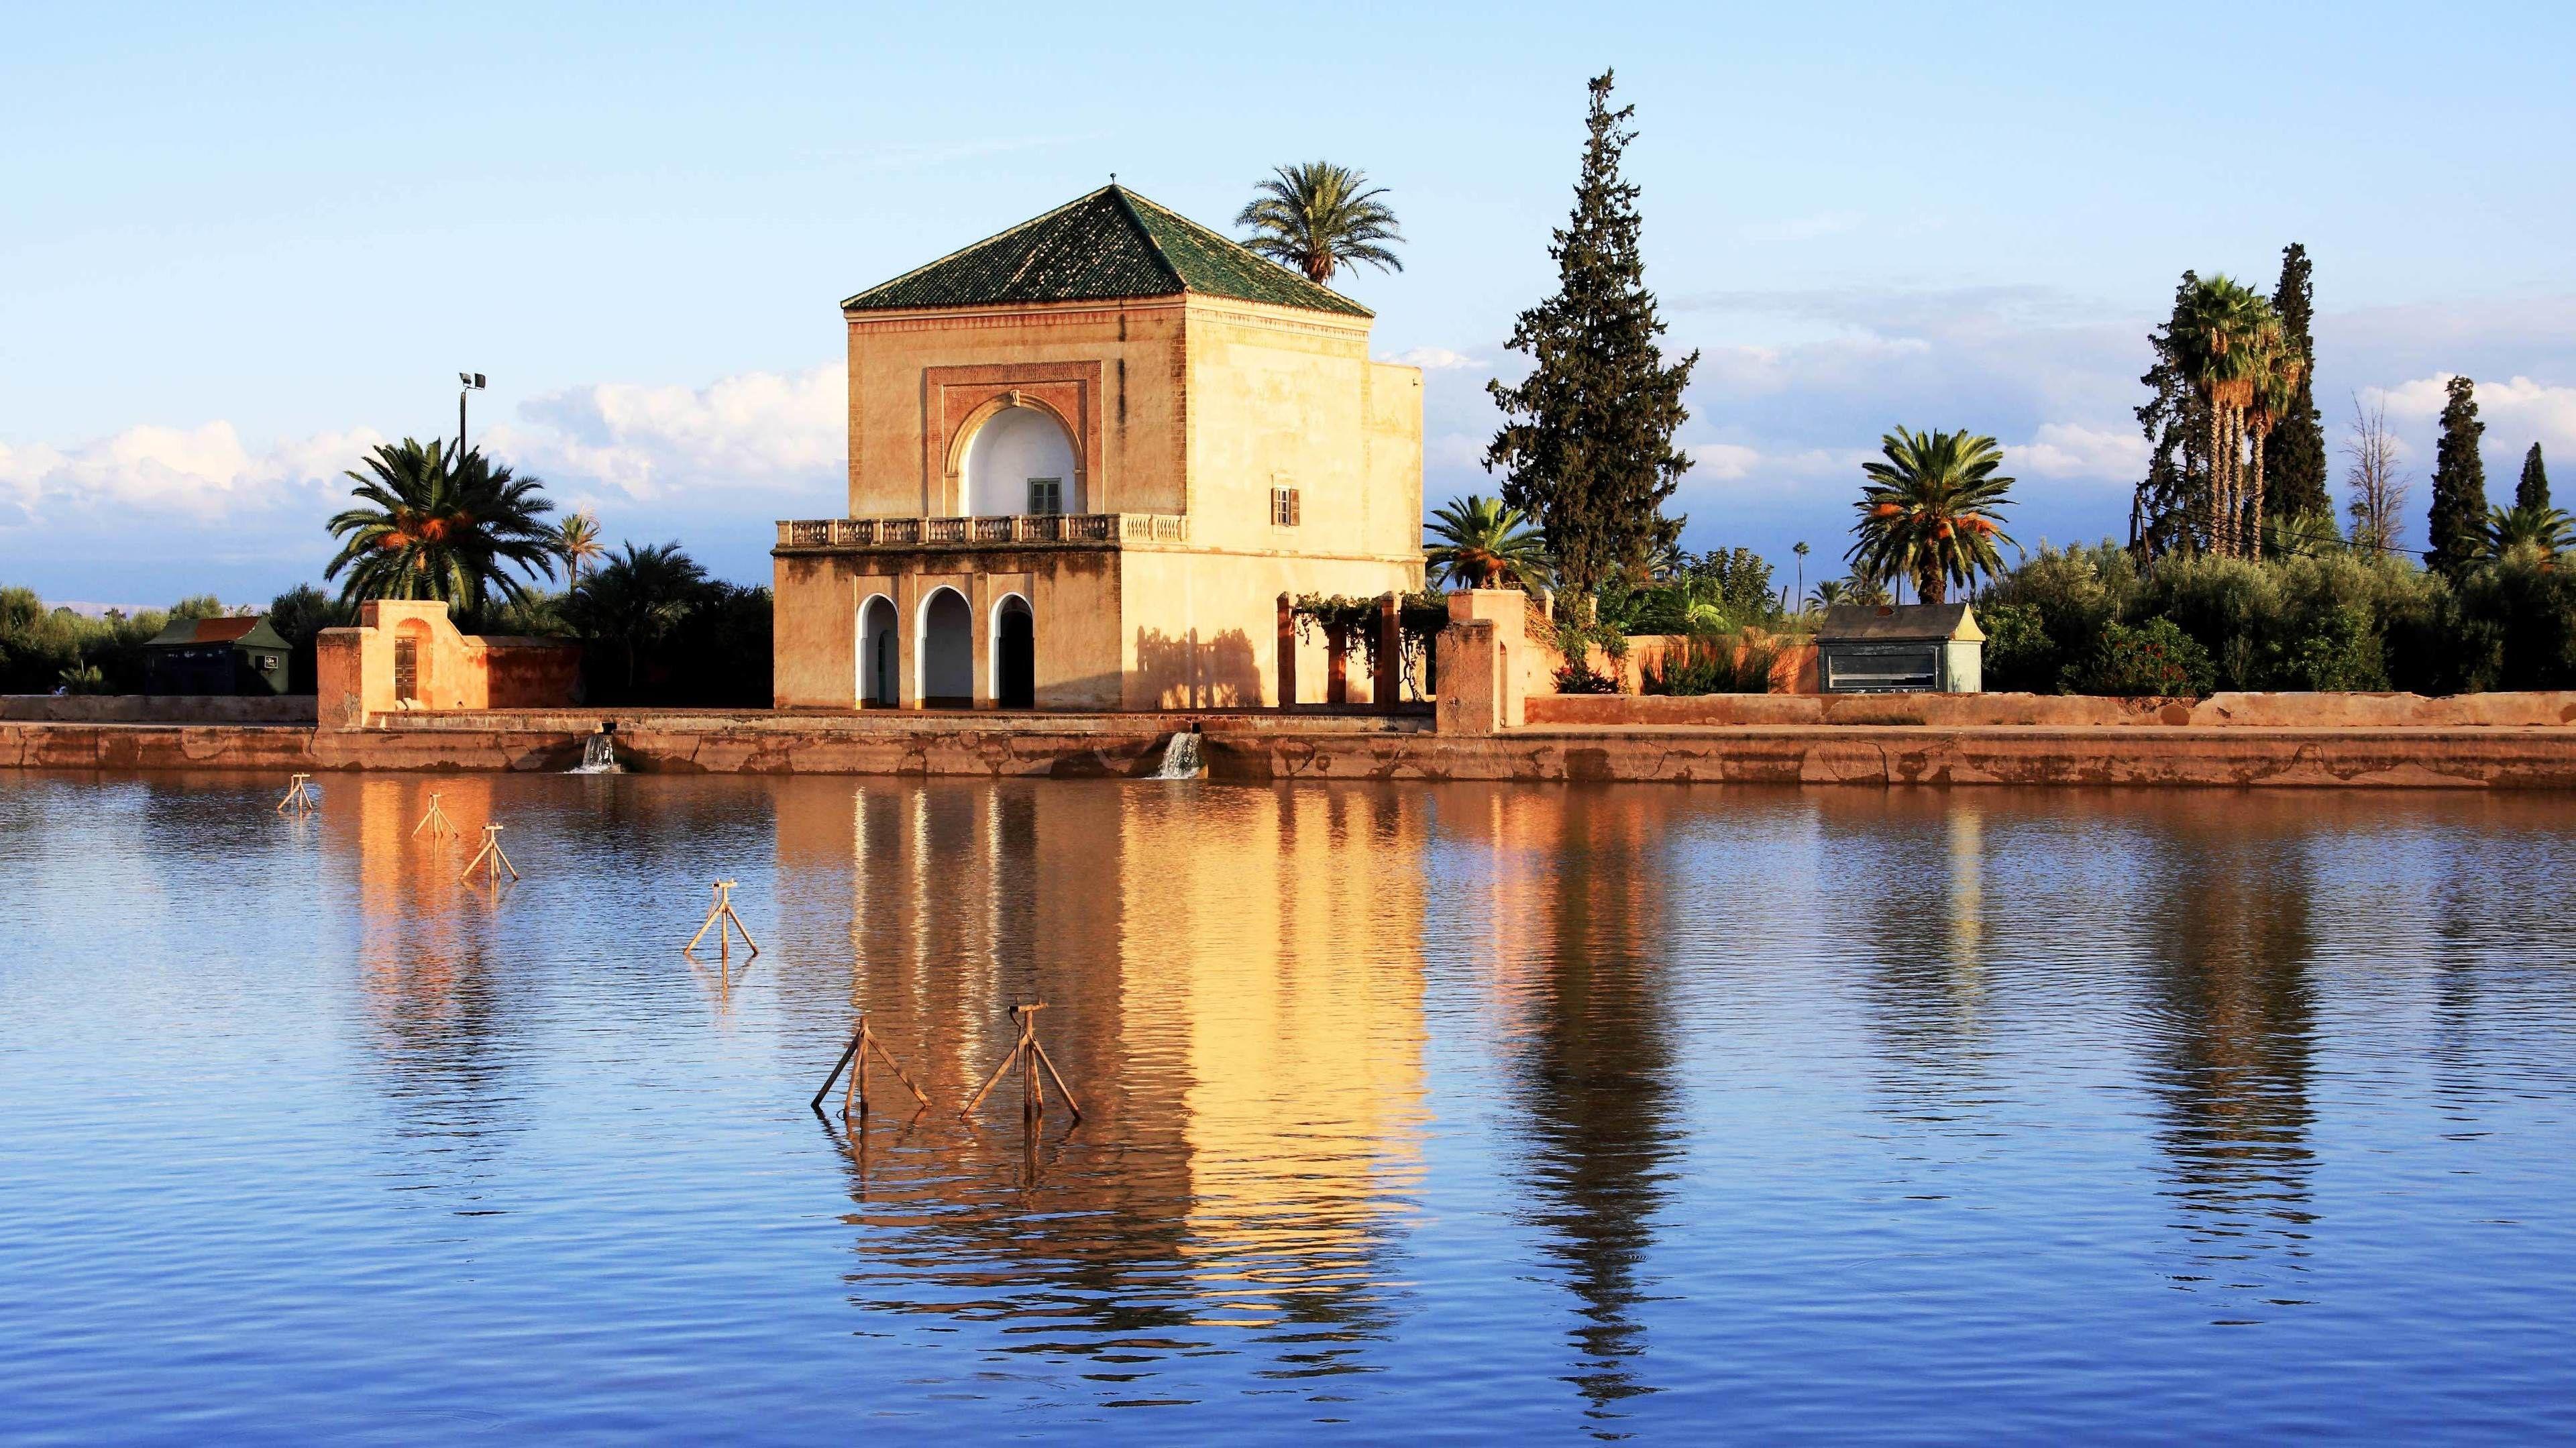 Gorgeous view of the Menara gardens in Marrakech